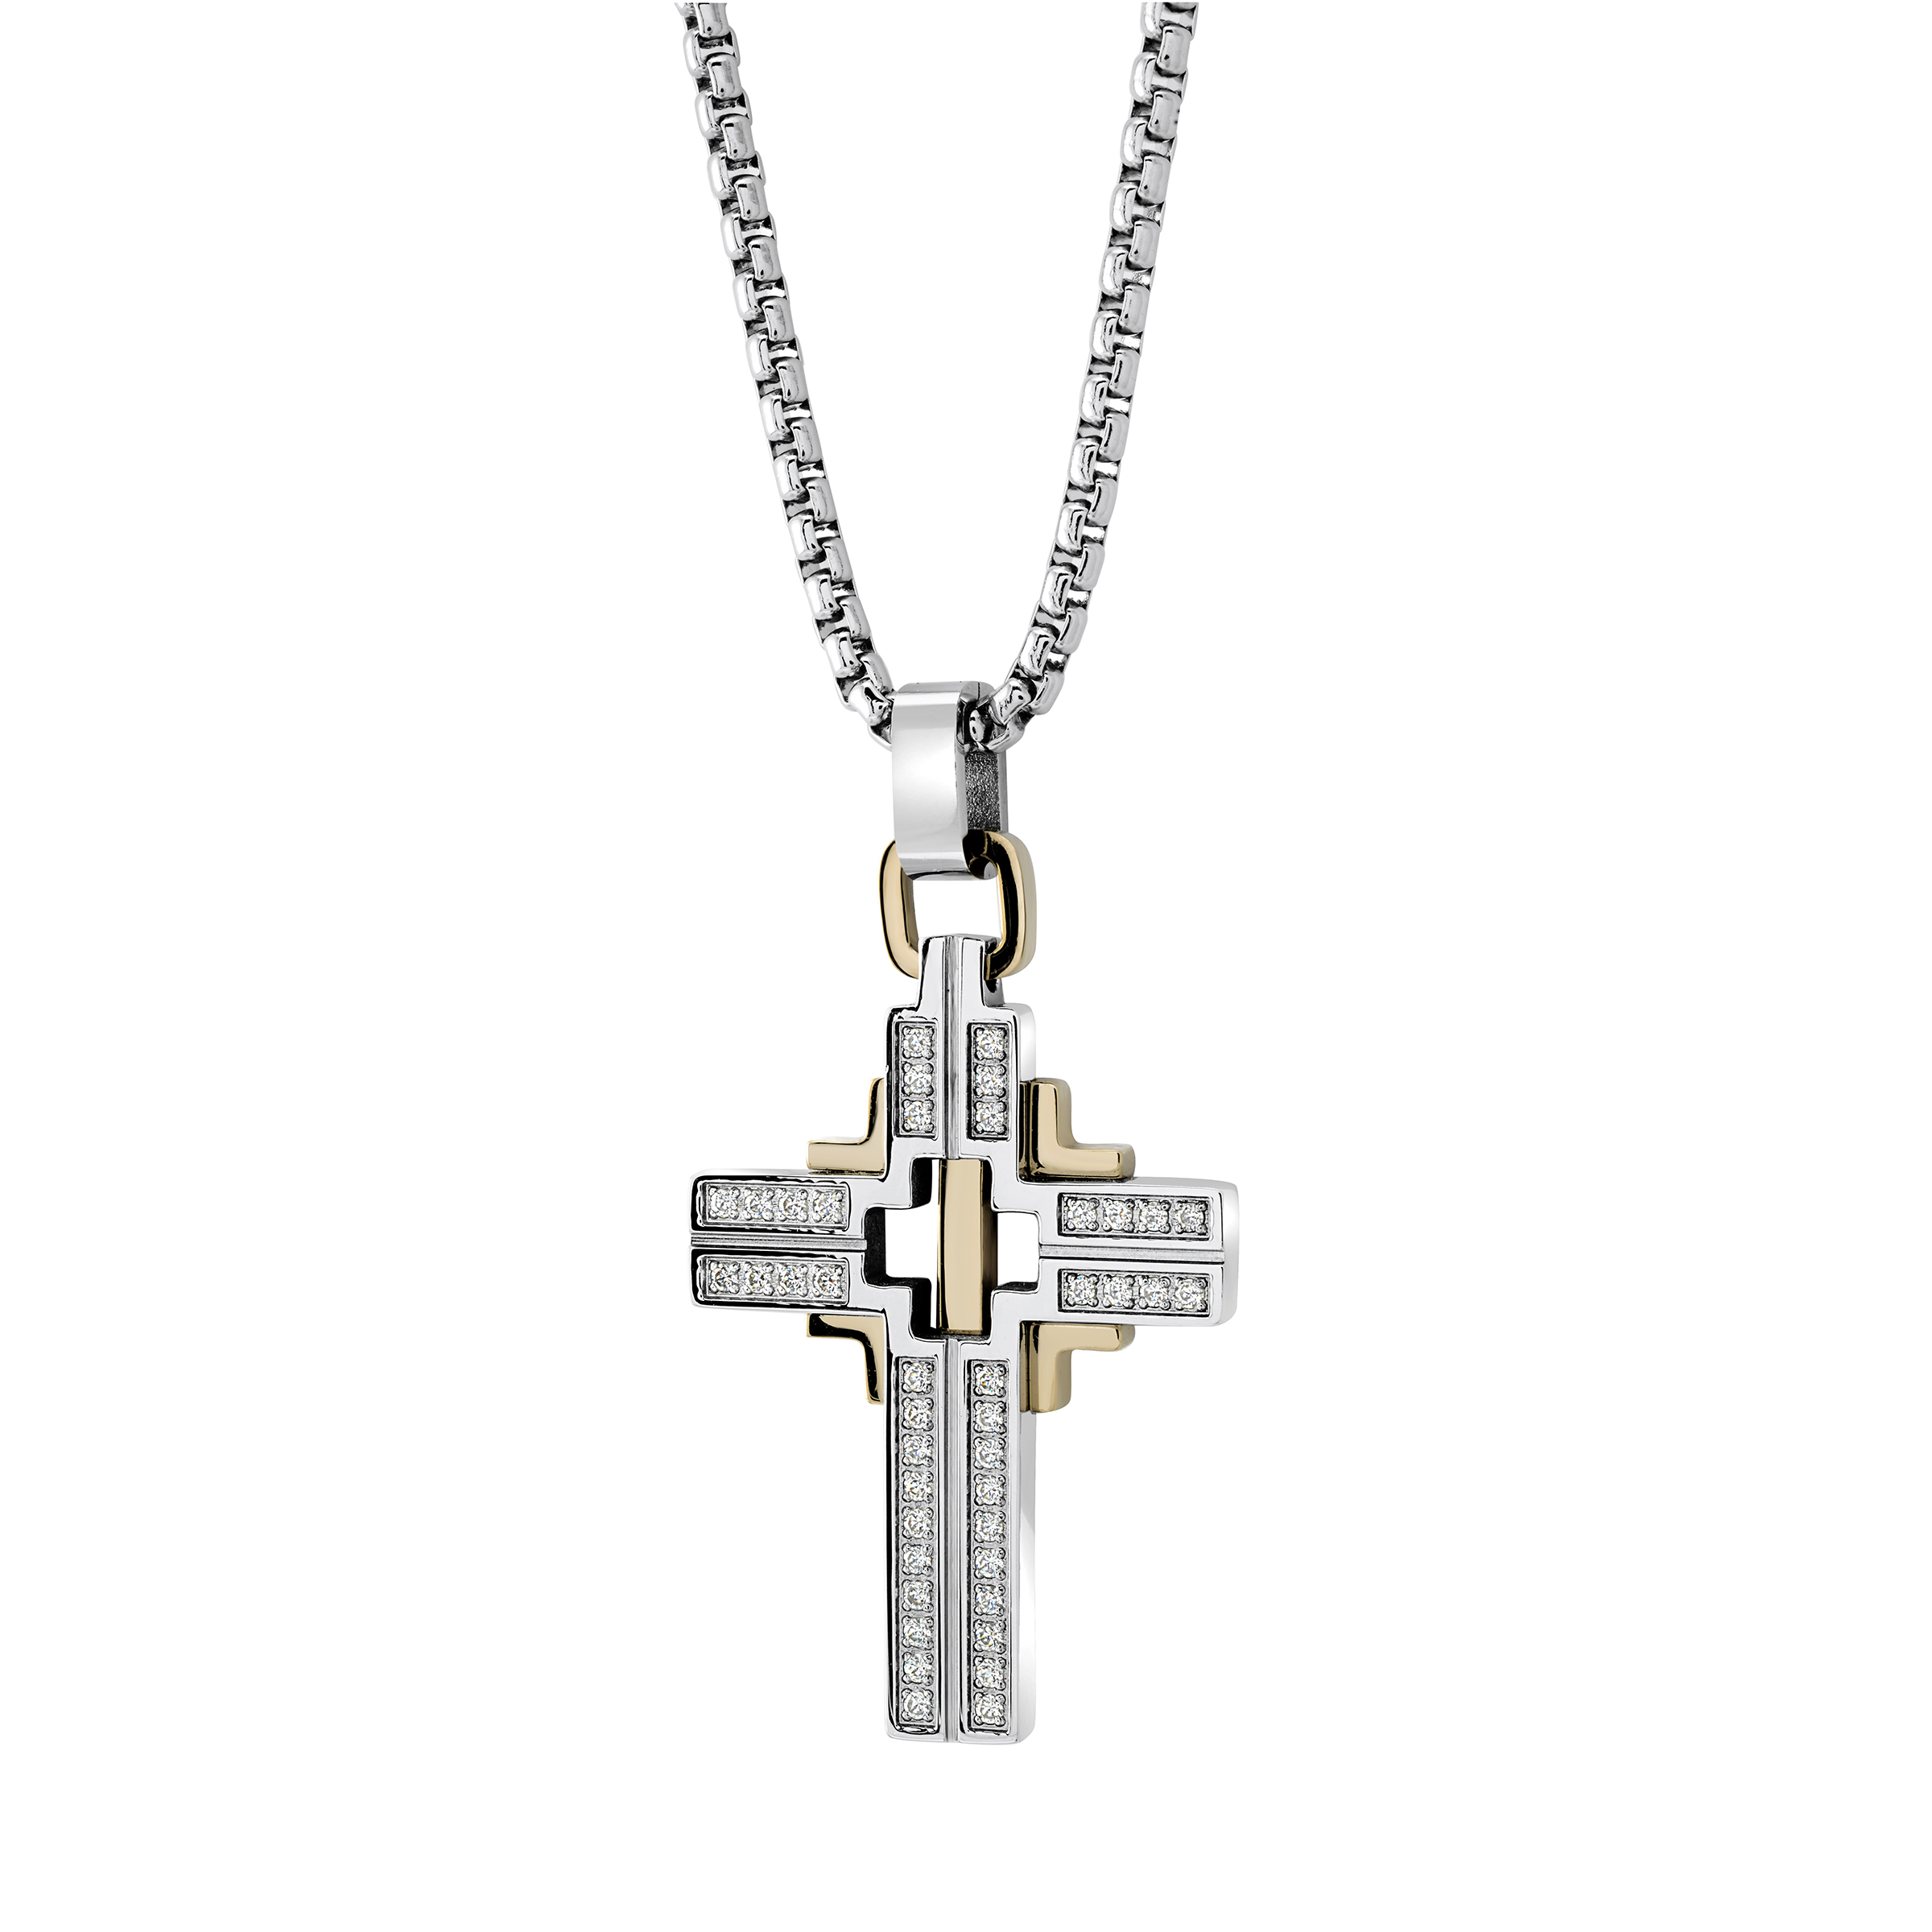 Cross pendant - 2-tone stainless steel & Cubic zirconia